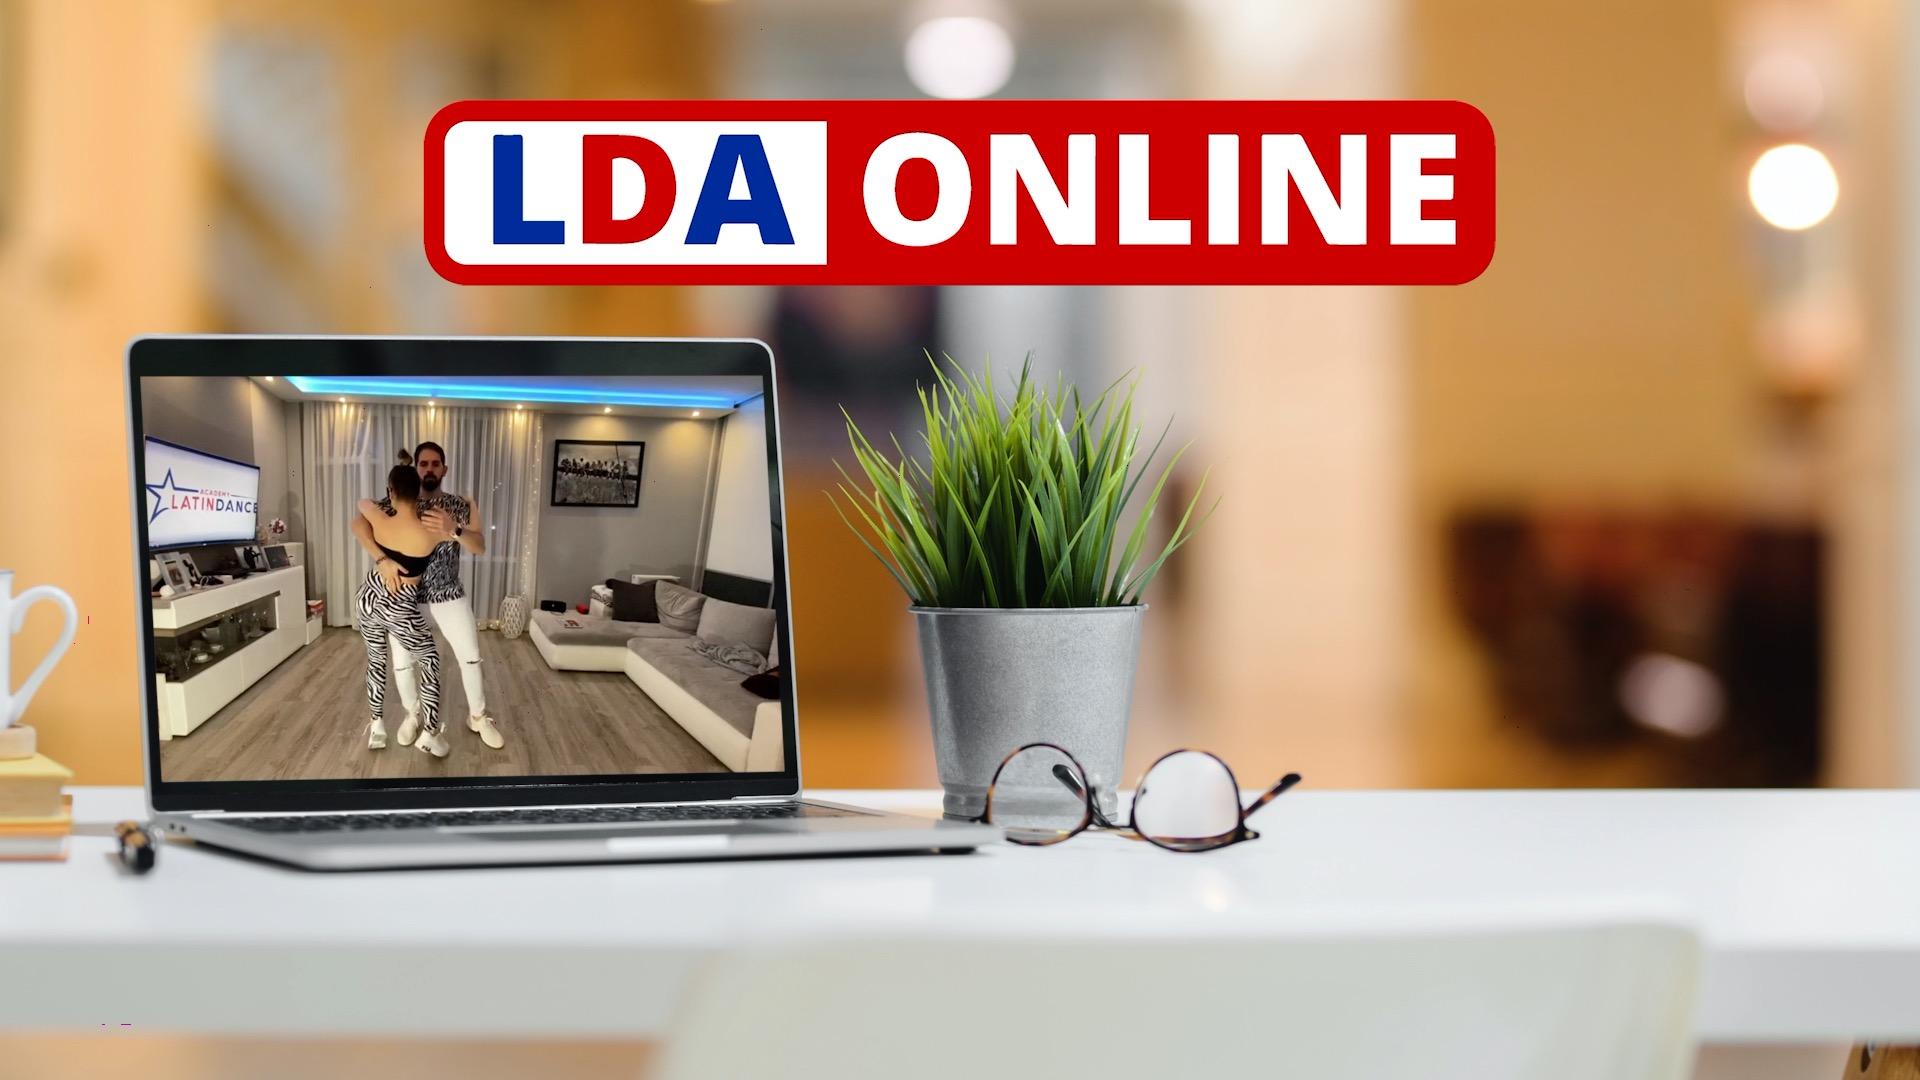 lda-online-2-lda-szkola-tanca-zajecia